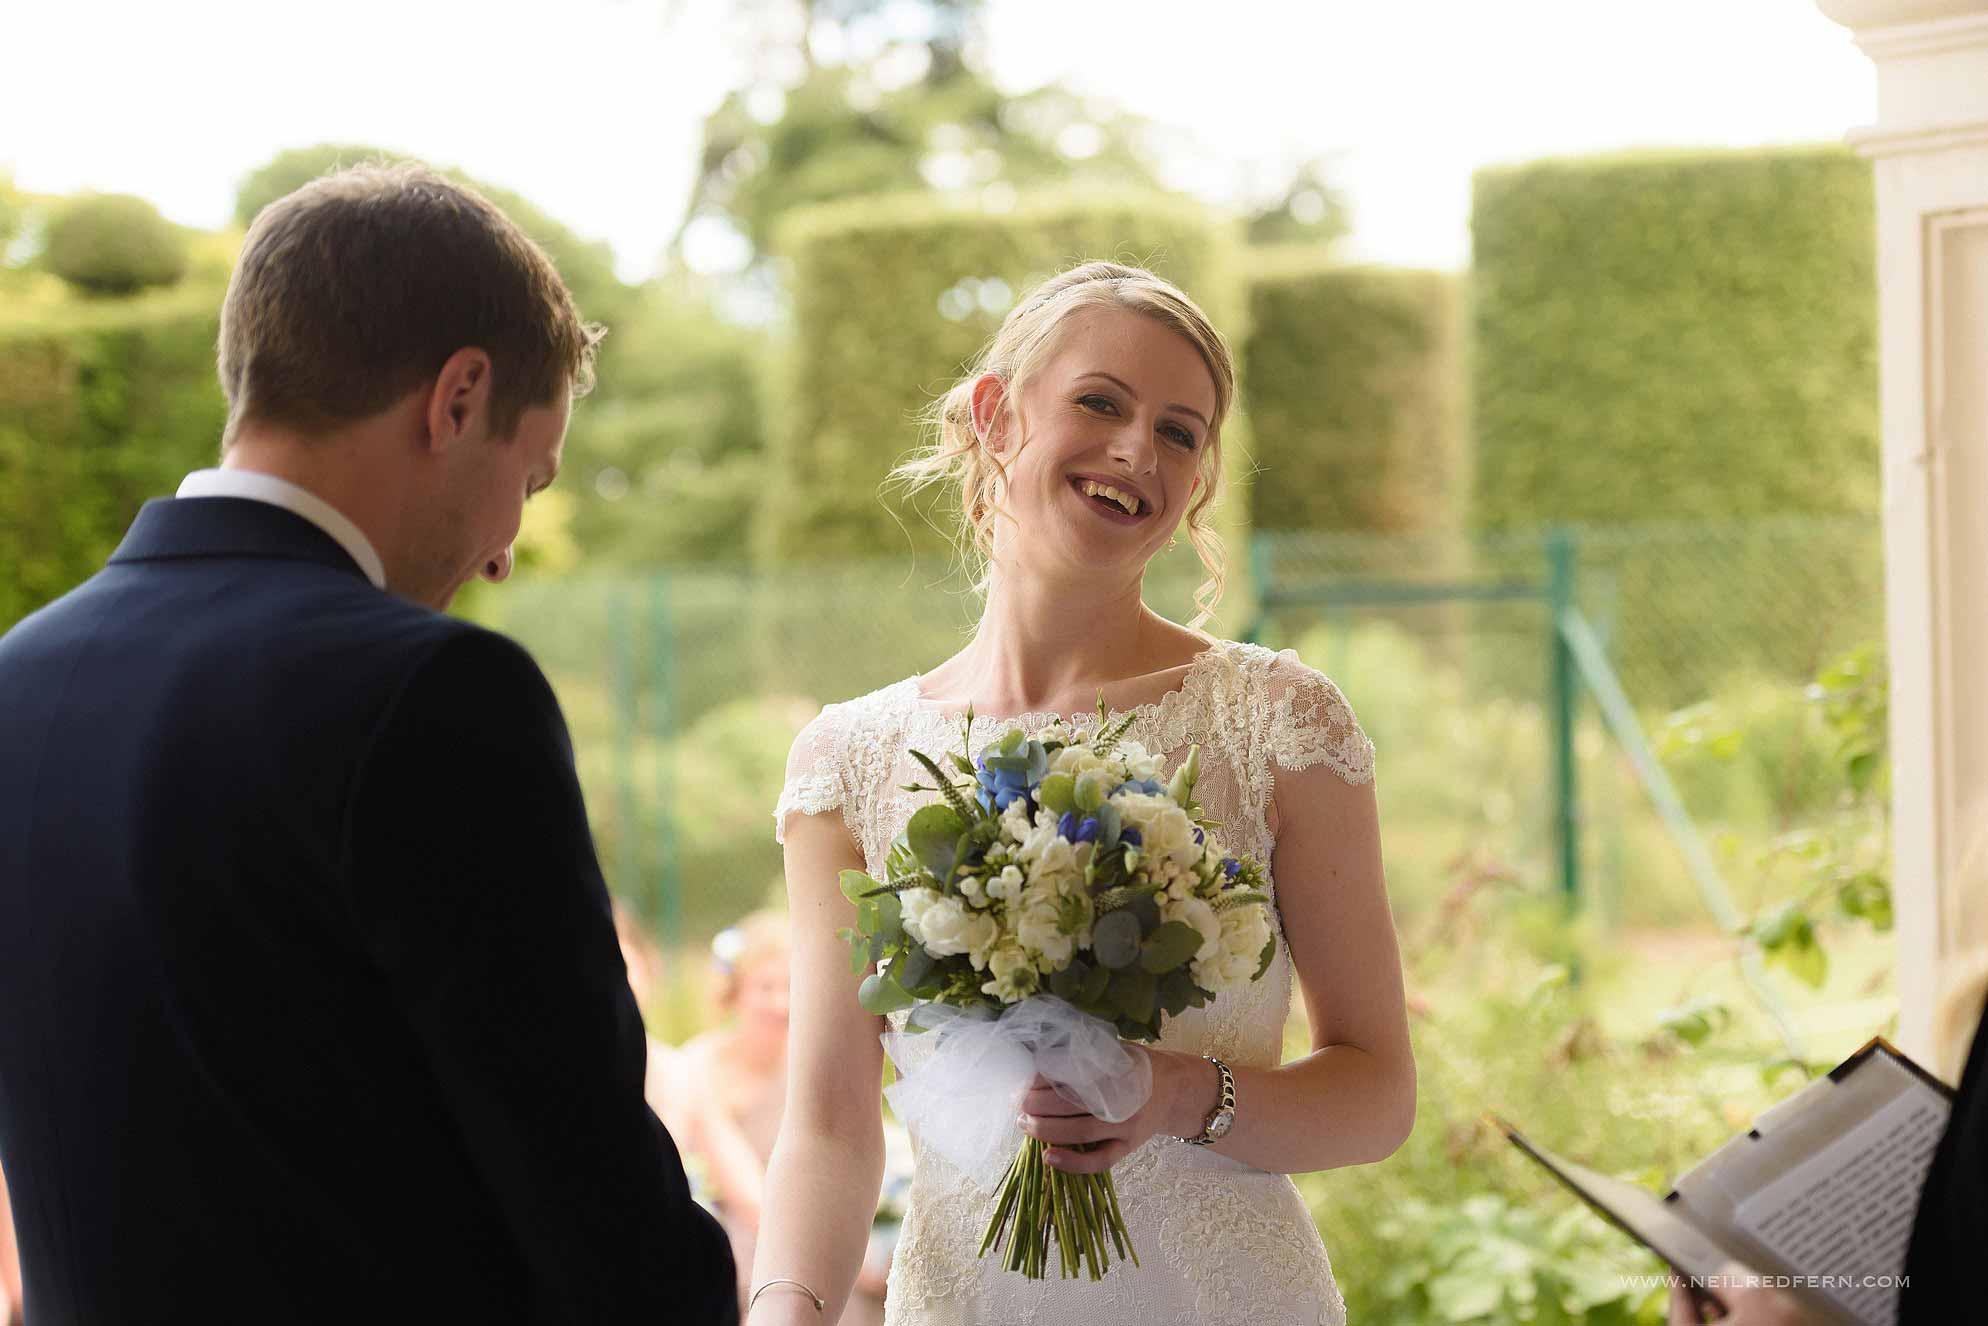 outdoor-wedding-ceremony-in-cheshire-3